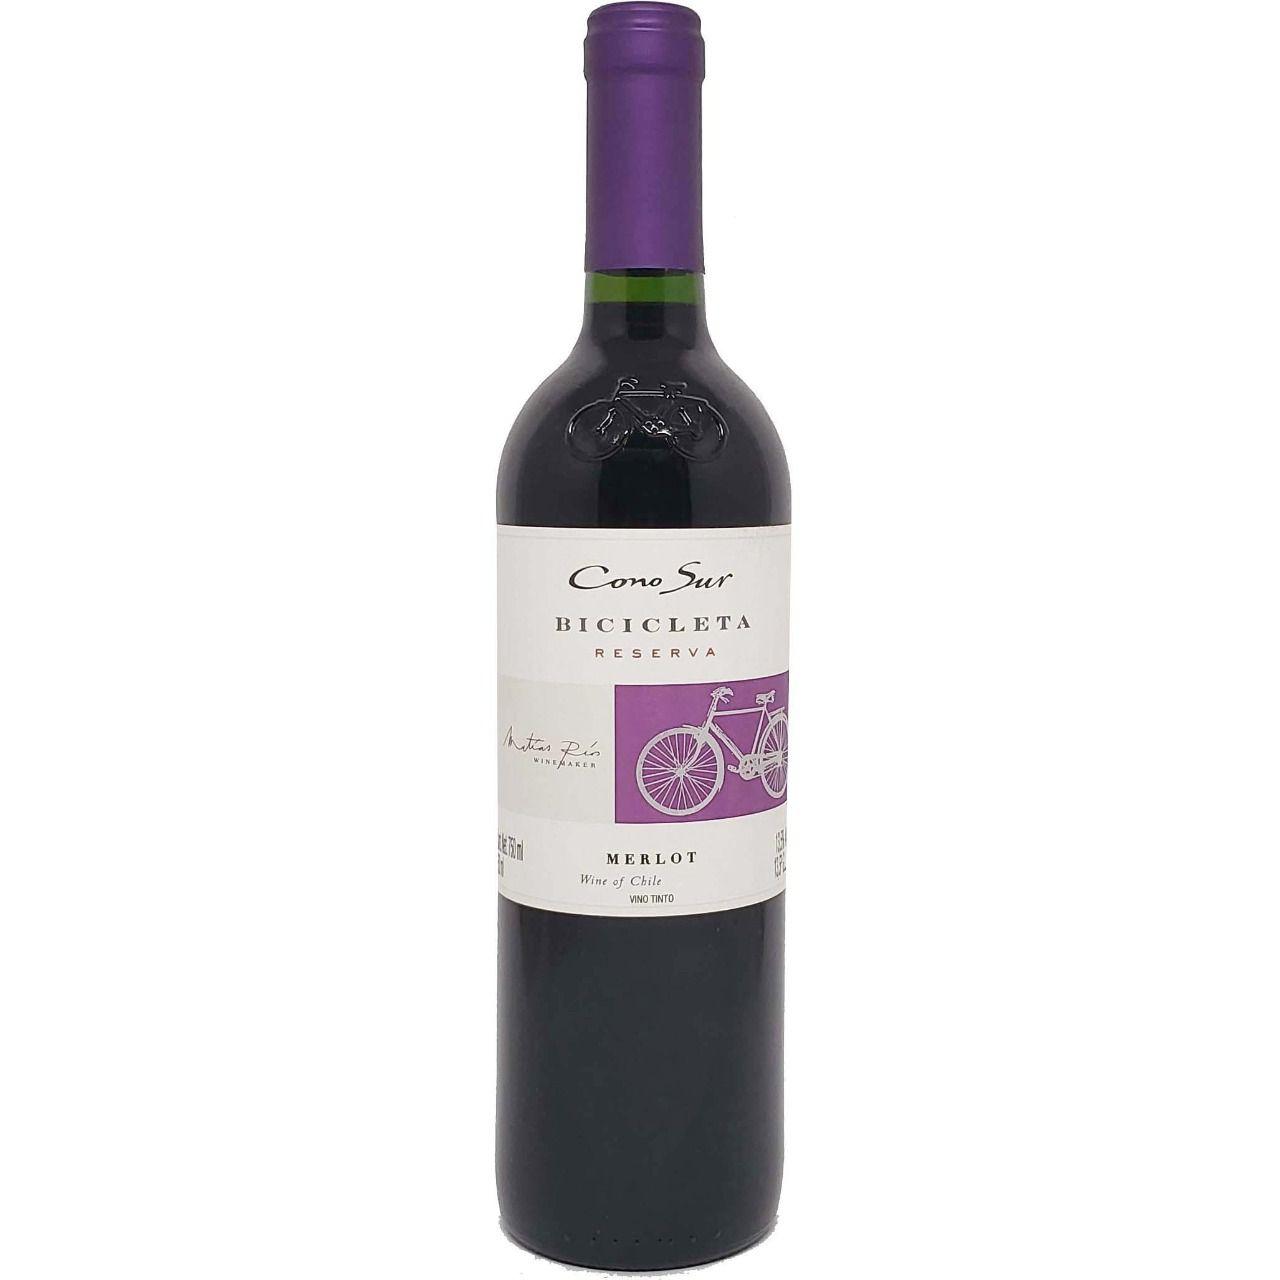 Vinho Tinto Reserva Bicicleta Cono Sur Merlot - 750ml -